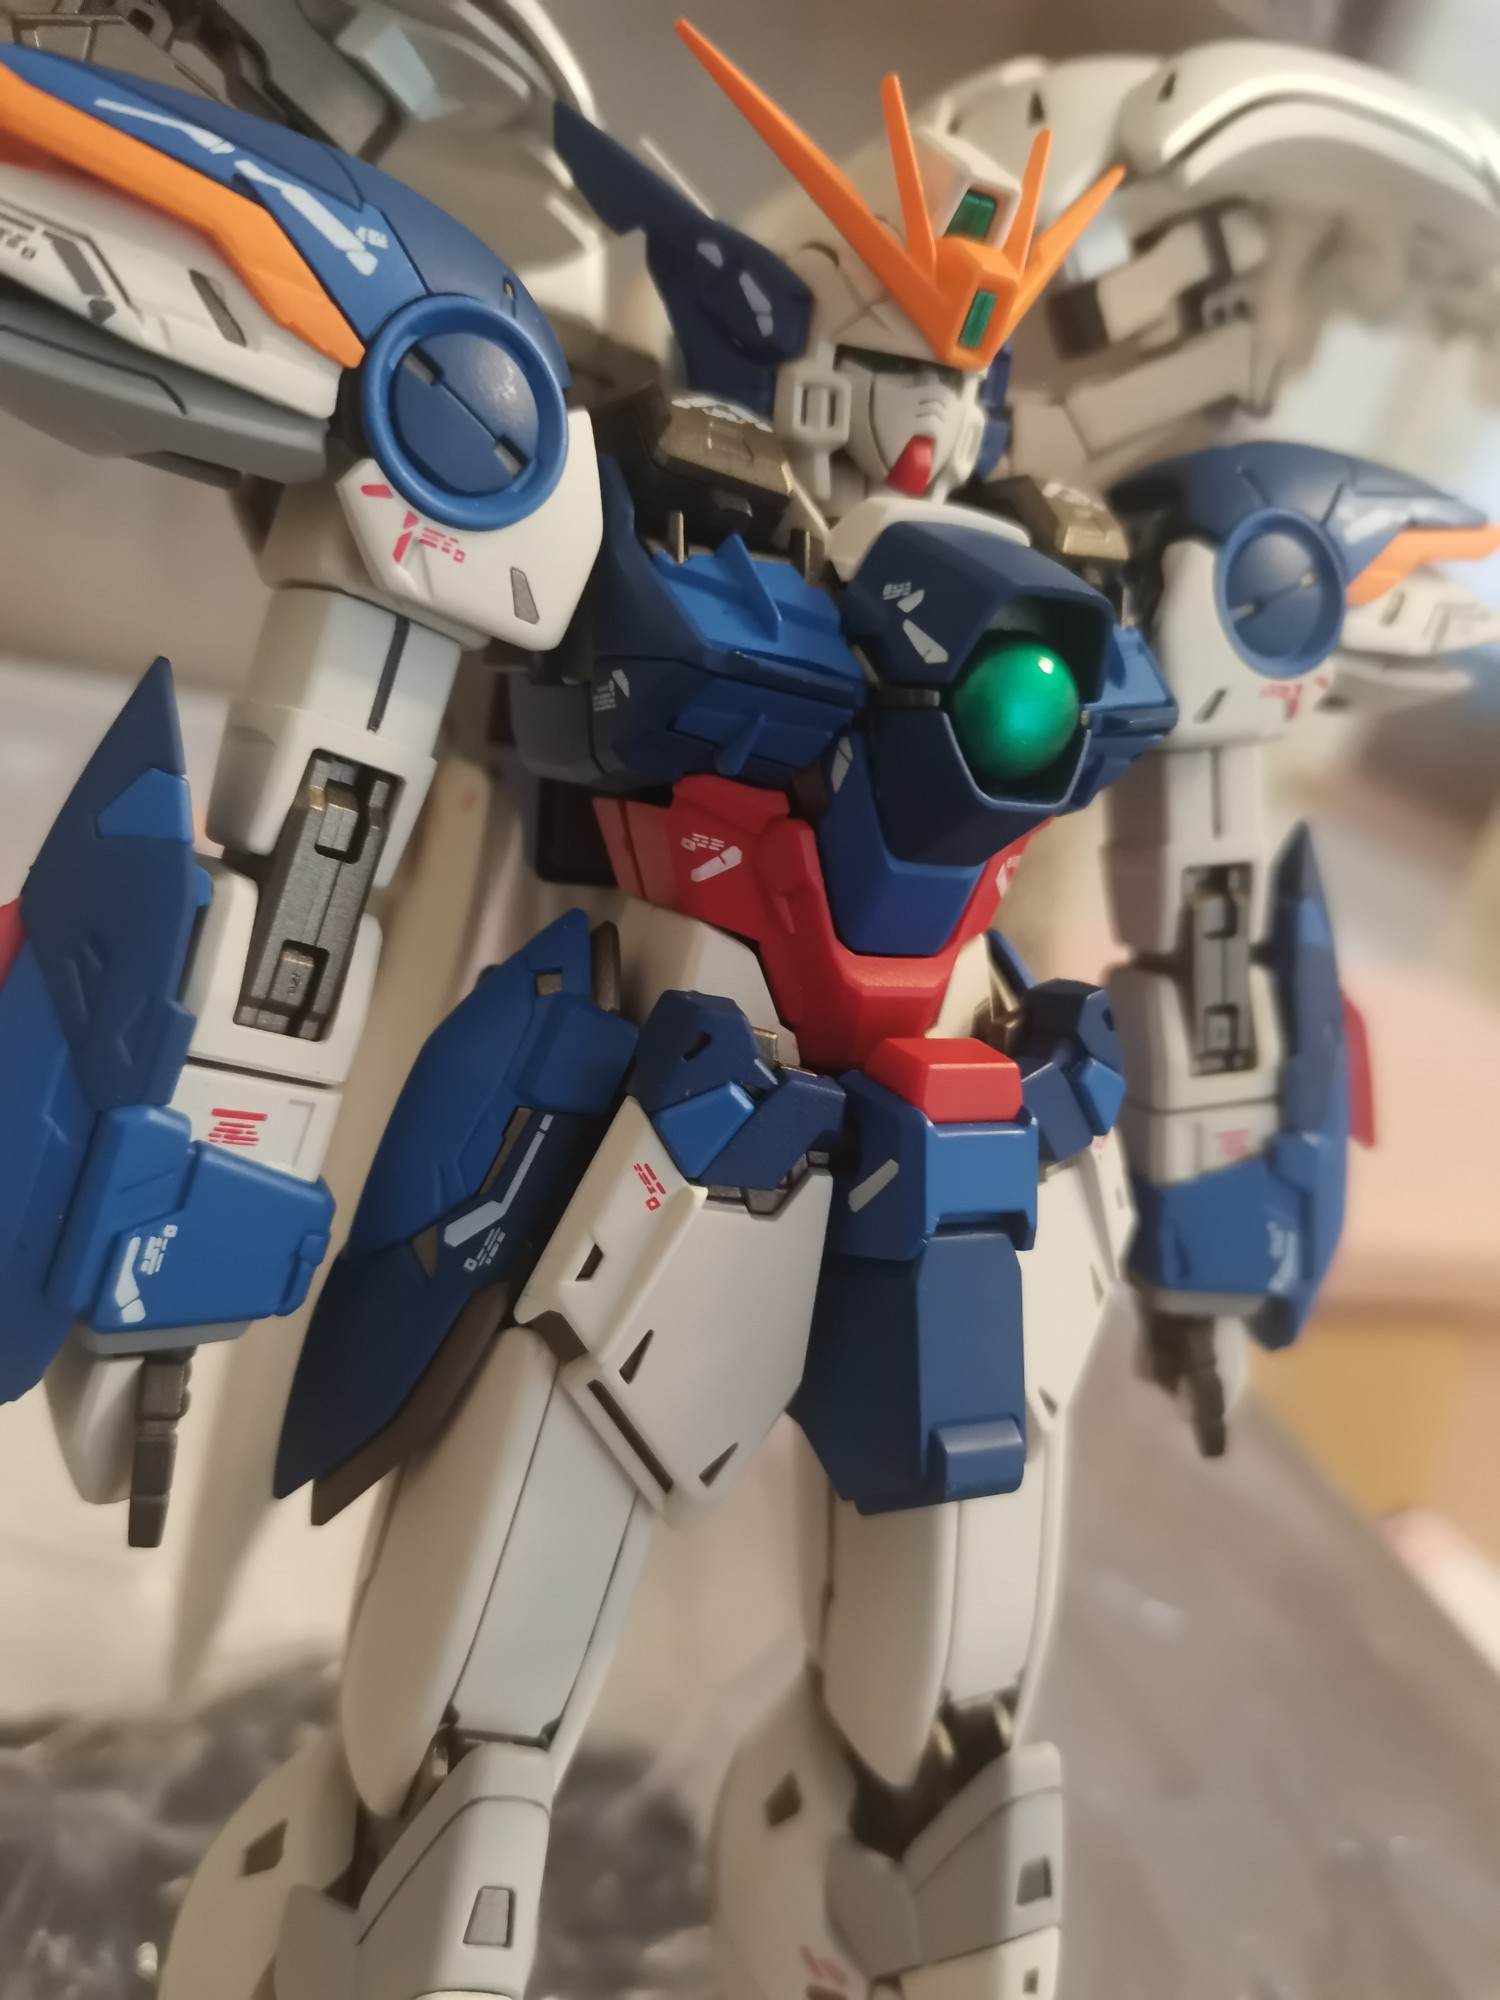 S610_navigator_MG_wingzero_review_008.jpg